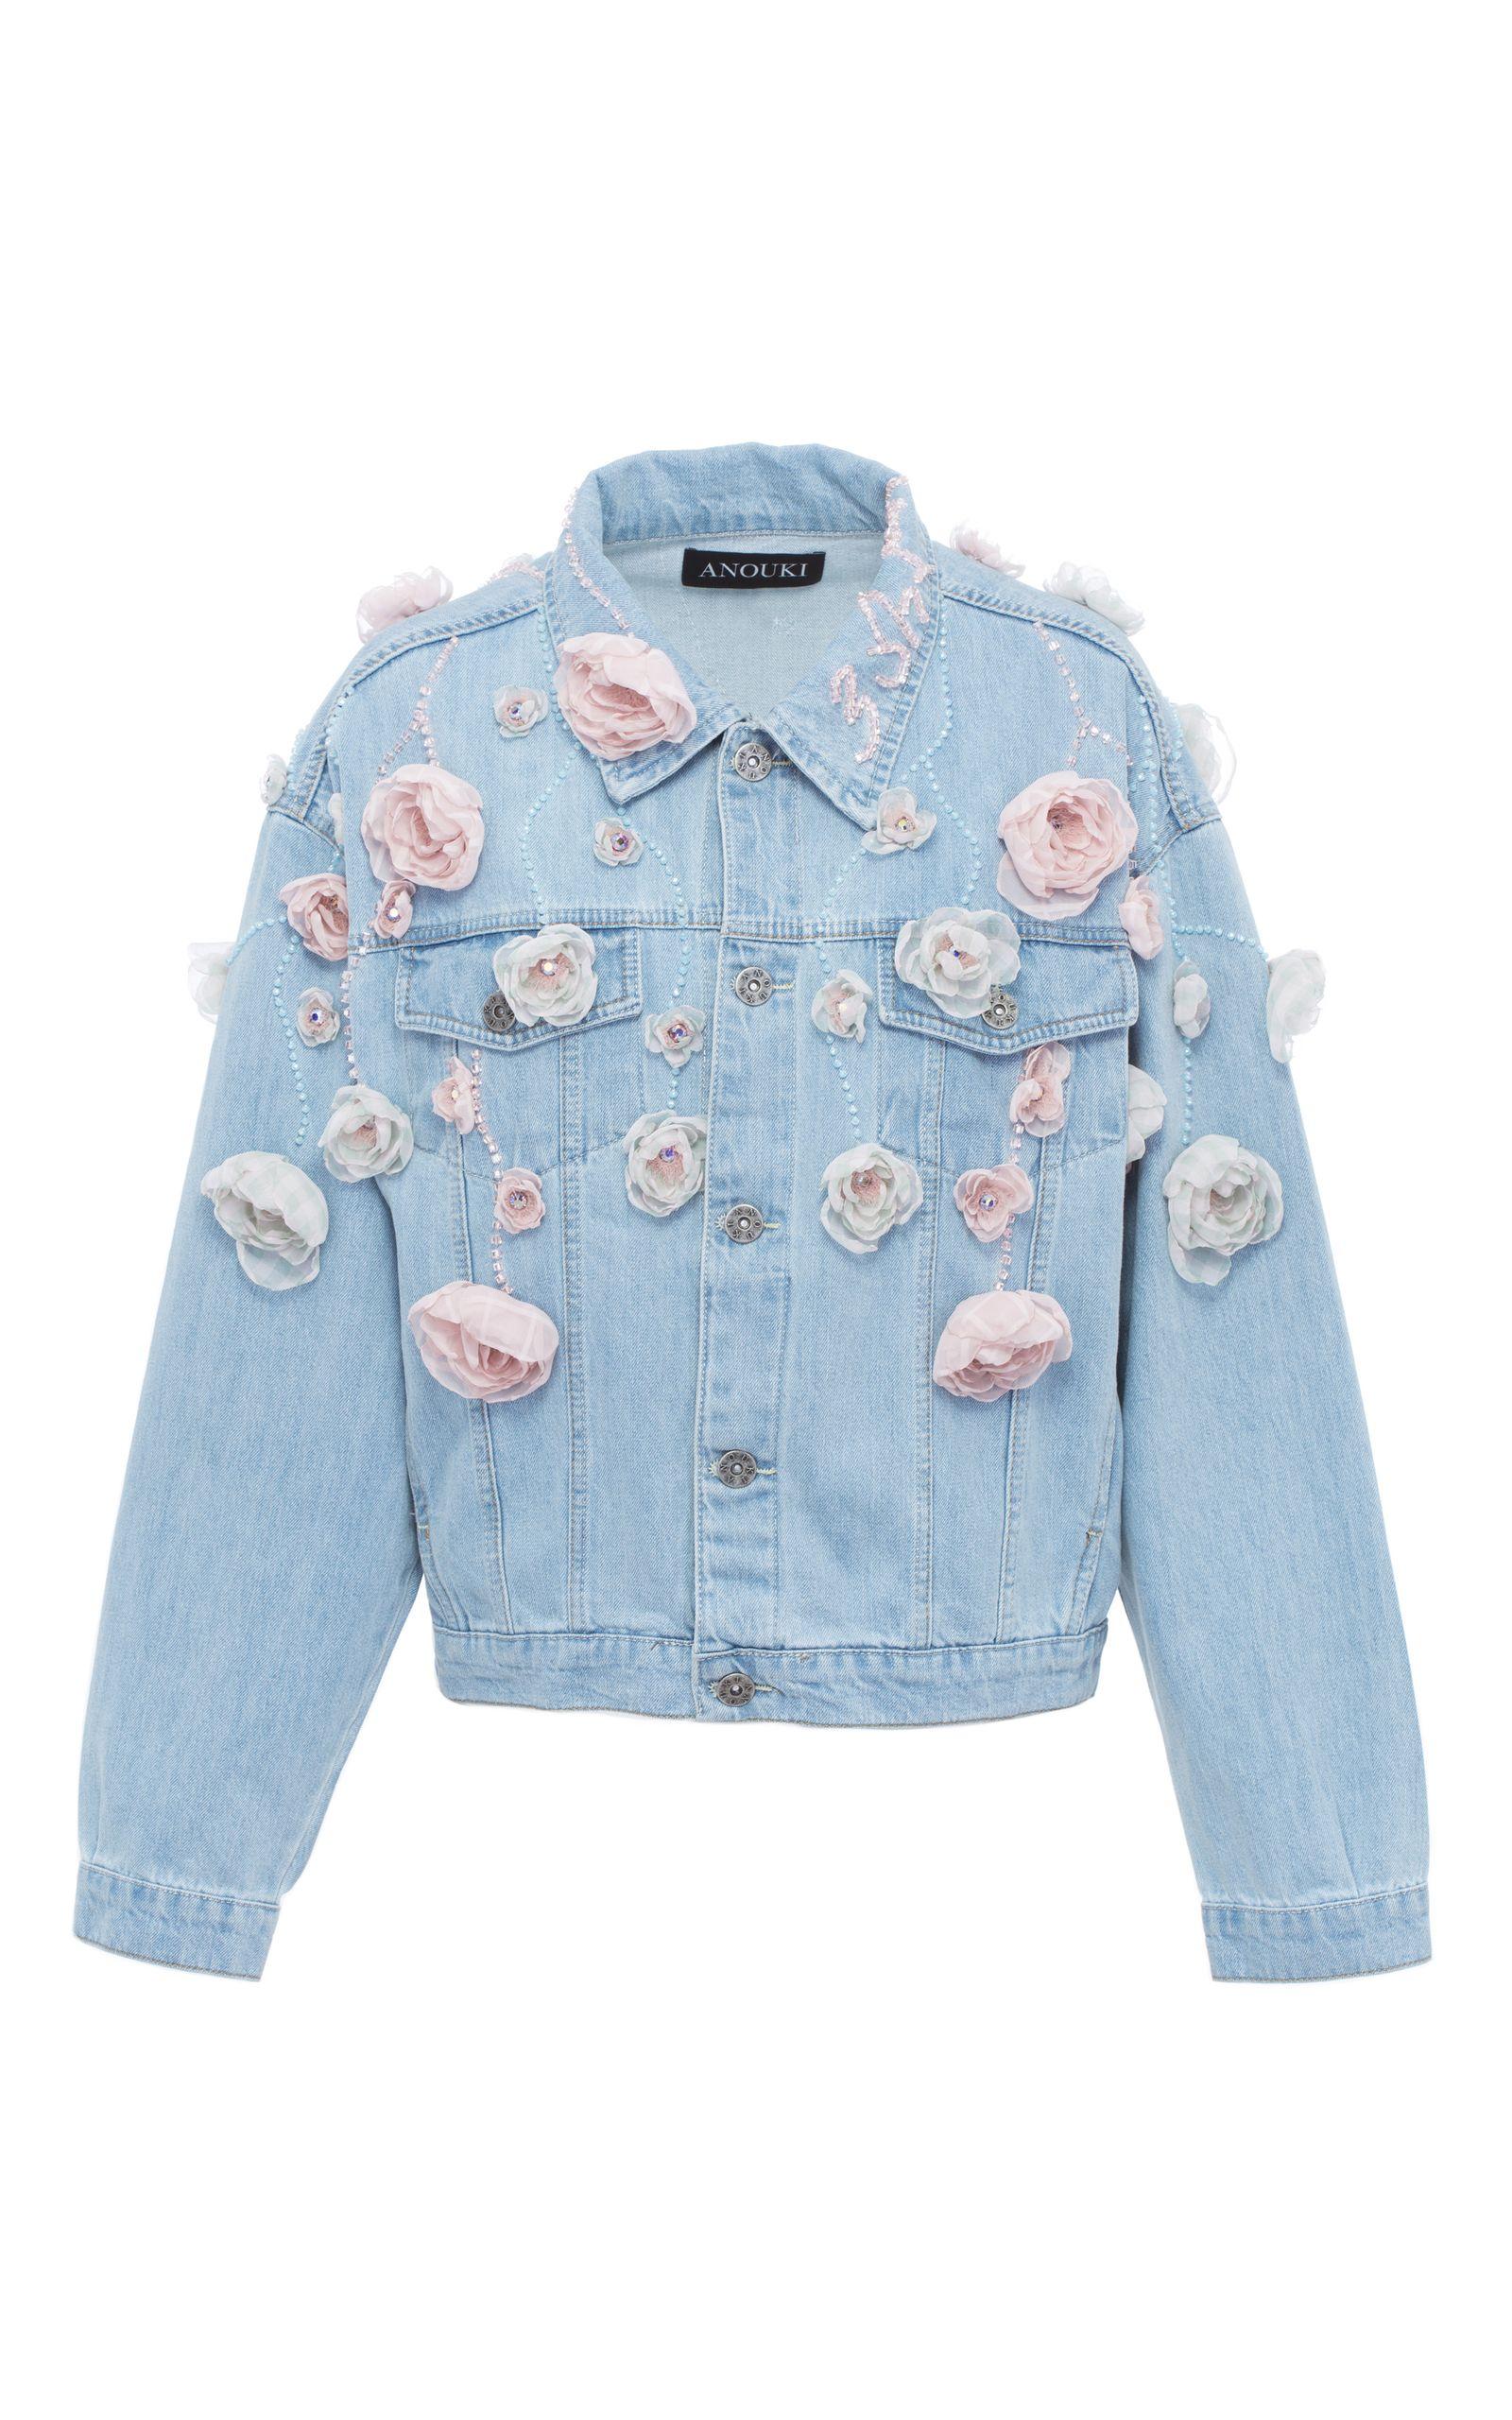 Floral Denim Jacket By Anouki Denim Jacket Floral Denim Printed Denim Jacket [ 2560 x 1600 Pixel ]